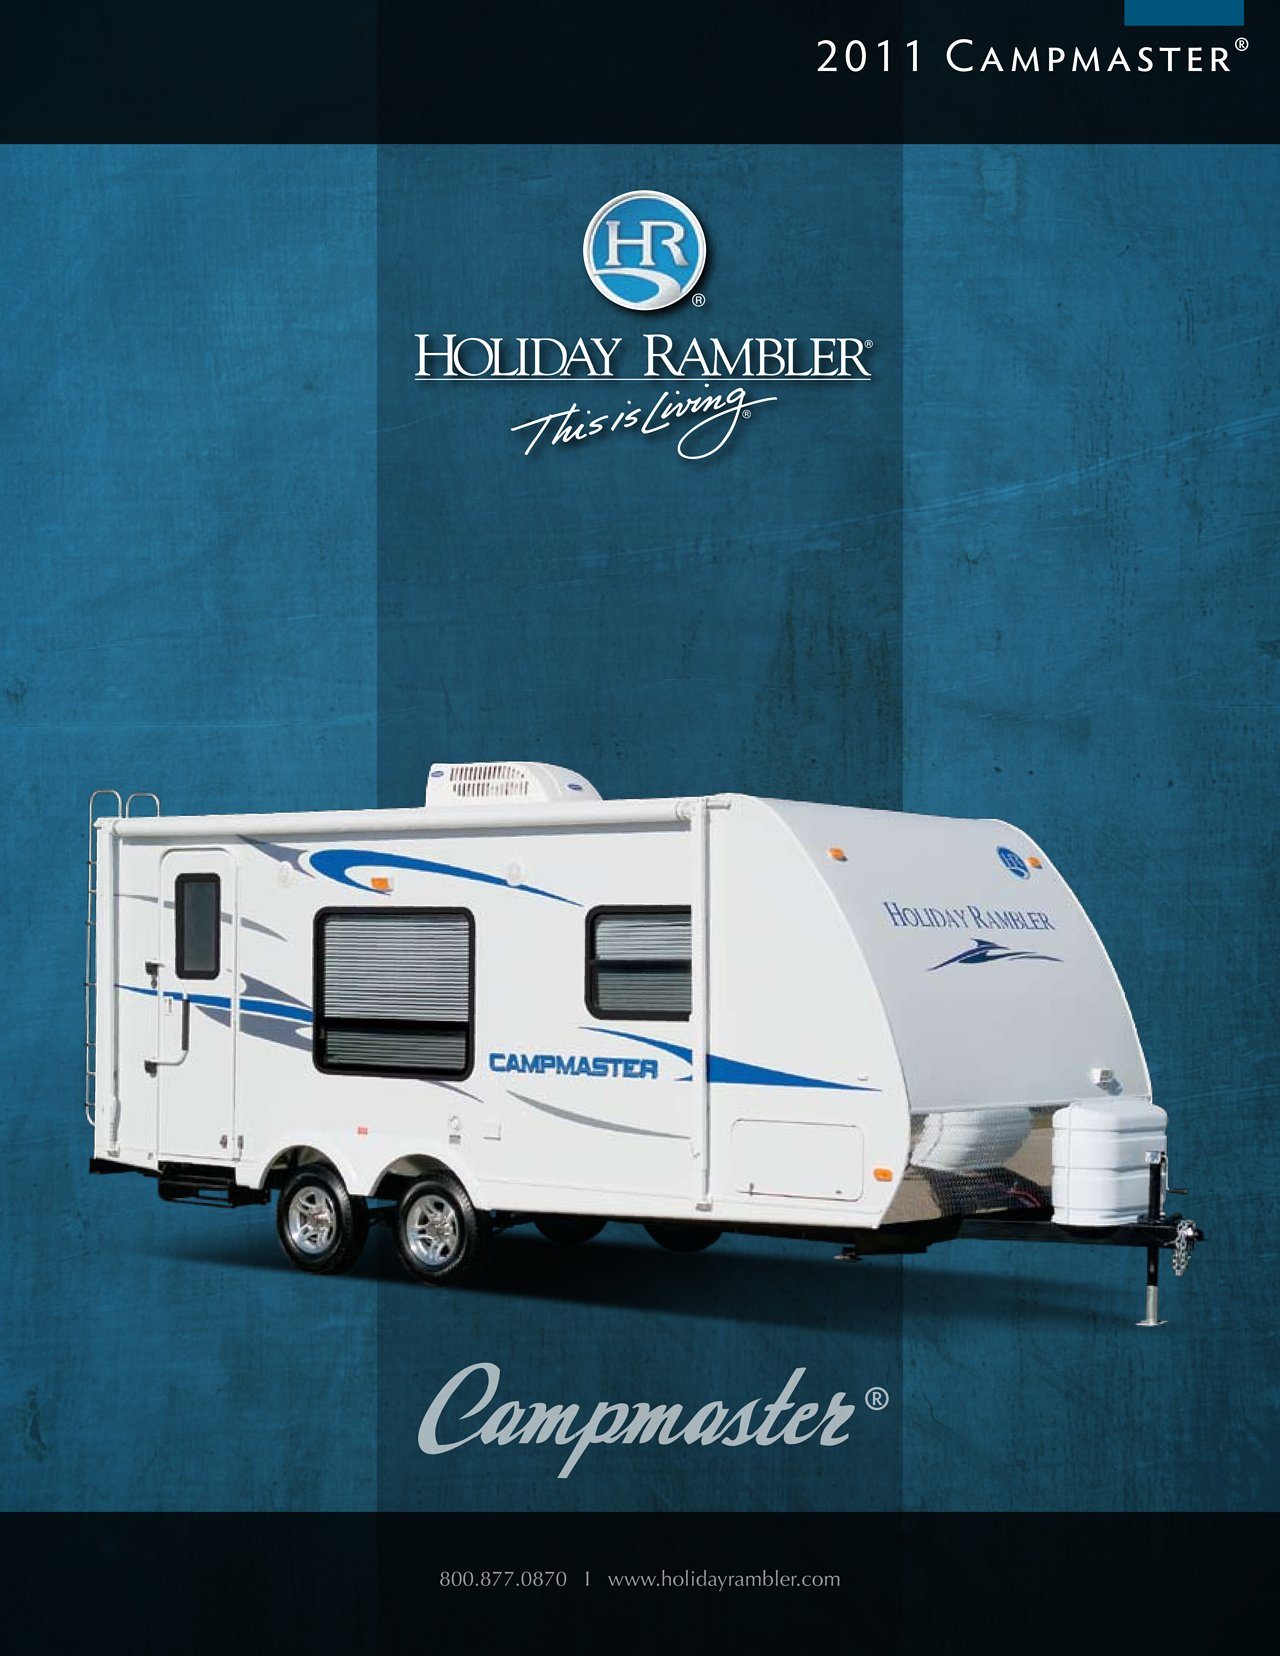 2011 Holiday Rambler Campmaster Brochure   Download RV brochures